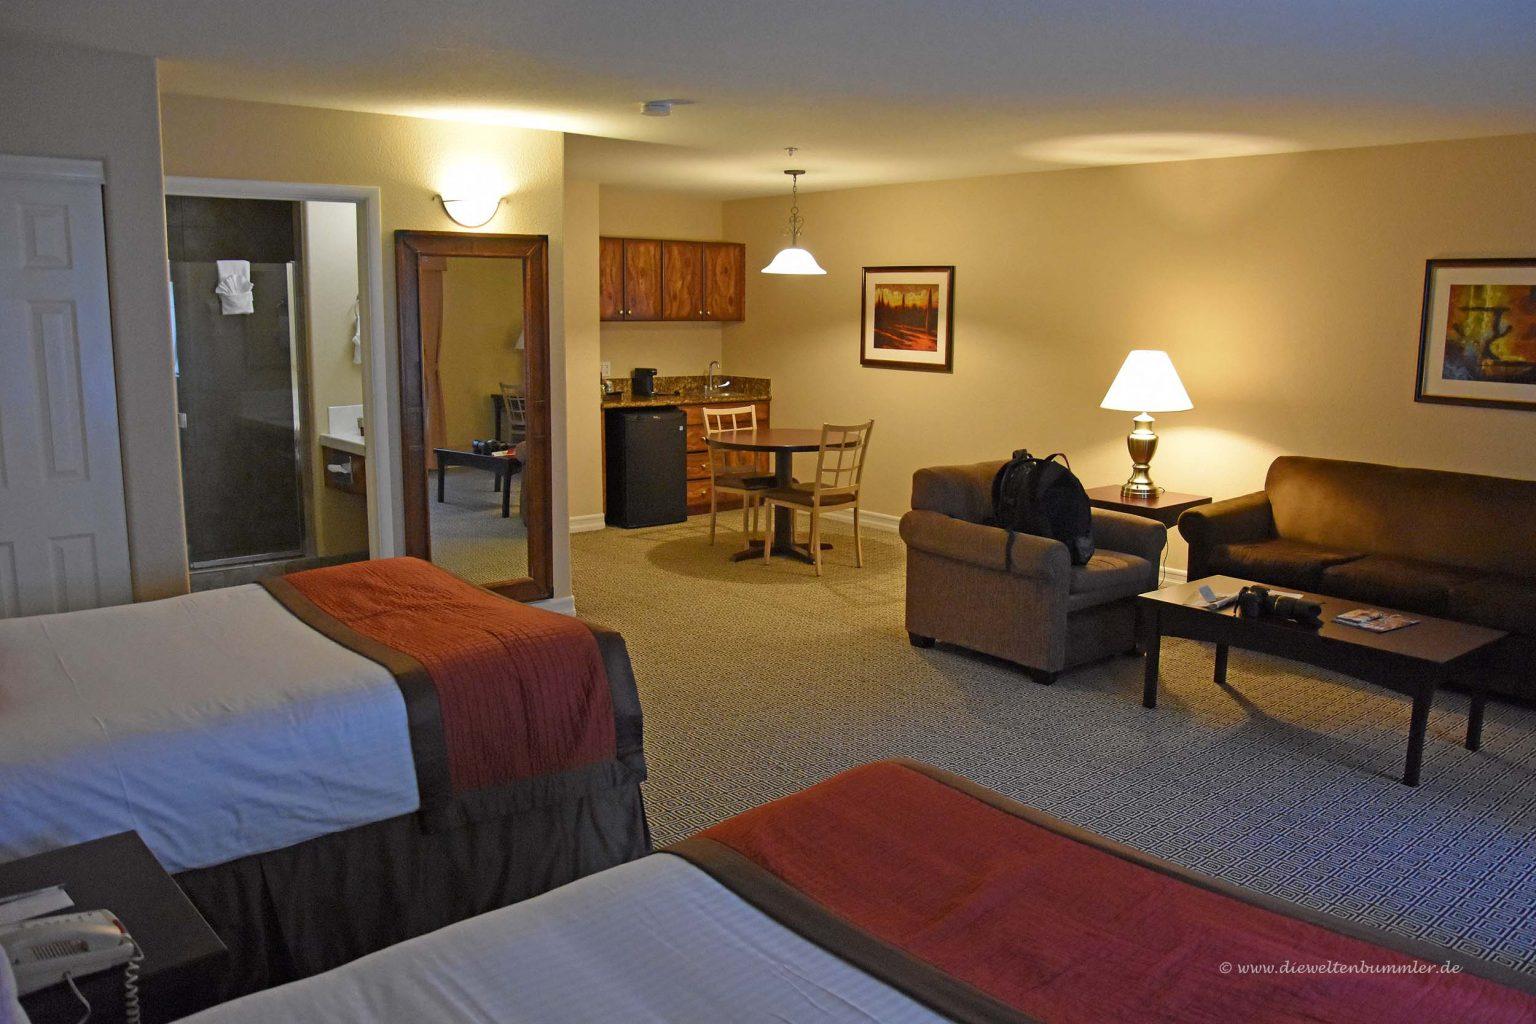 Tuscany Hotel in Las Vegas